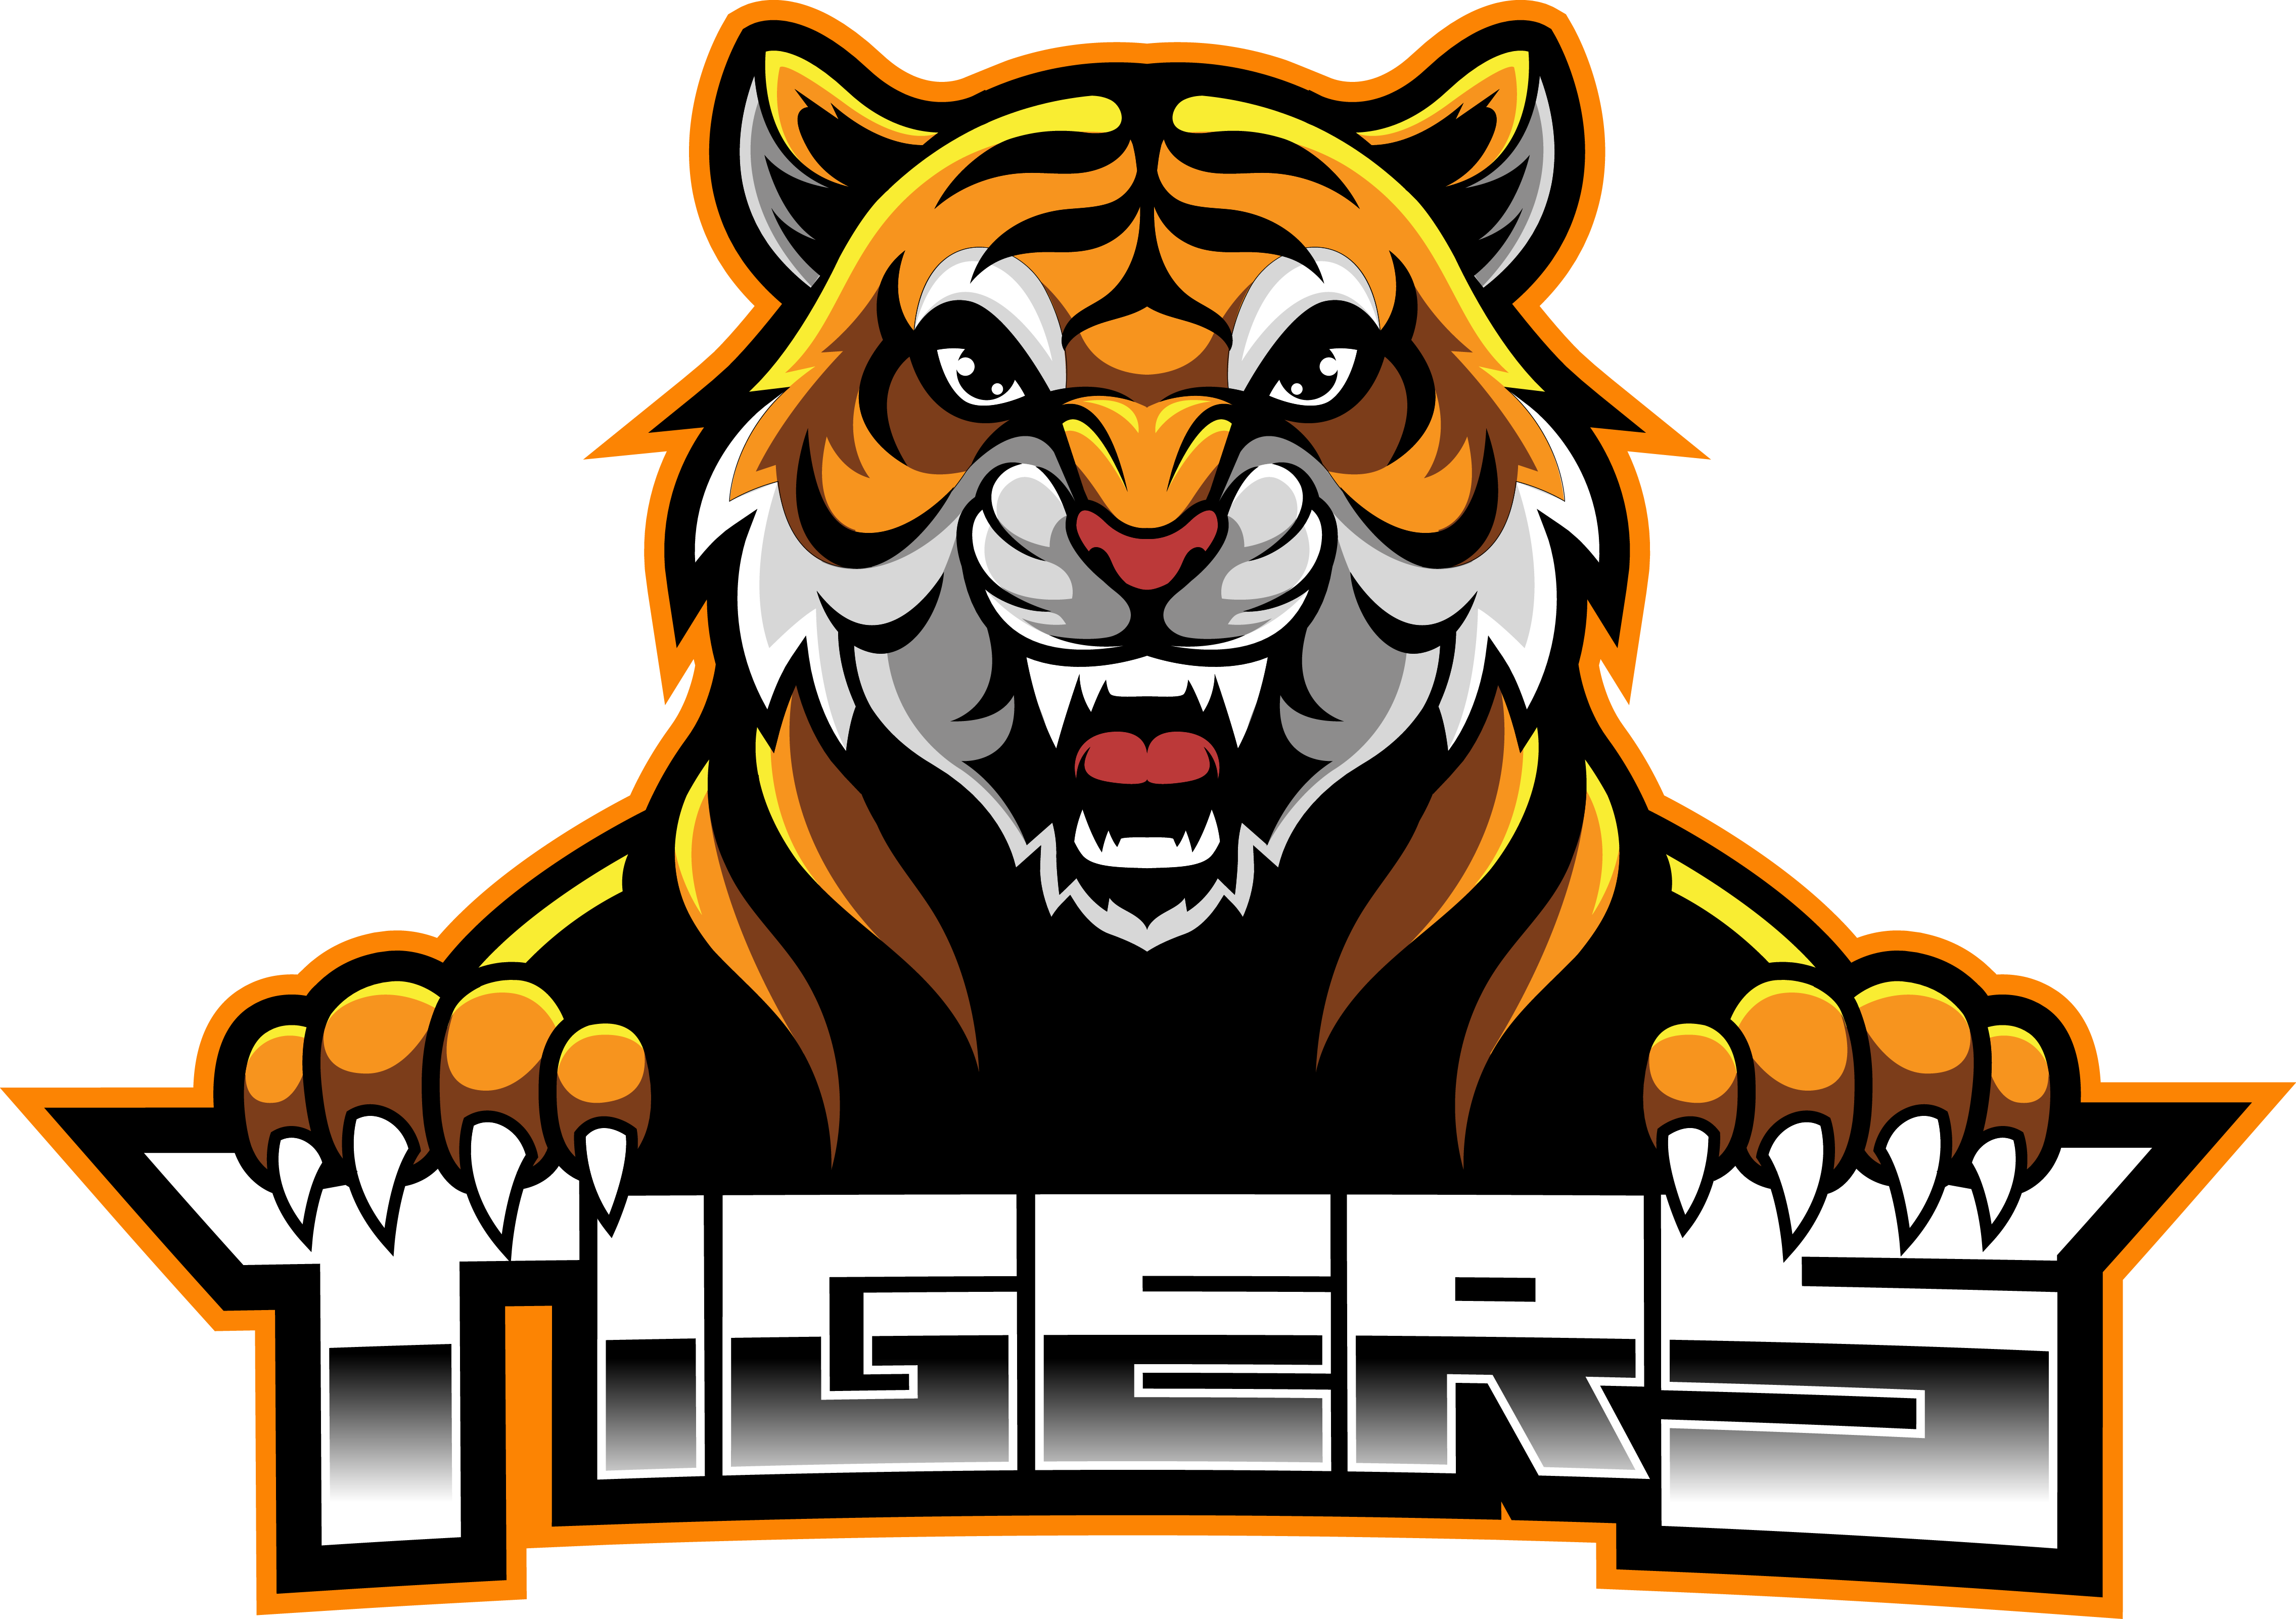 Tiger Face Esport Mascot Logo Design By Visink Thehungryjpeg Com Esport Spon Mascot Tiger Face Adver Tiger Face Mascot Animal Heads